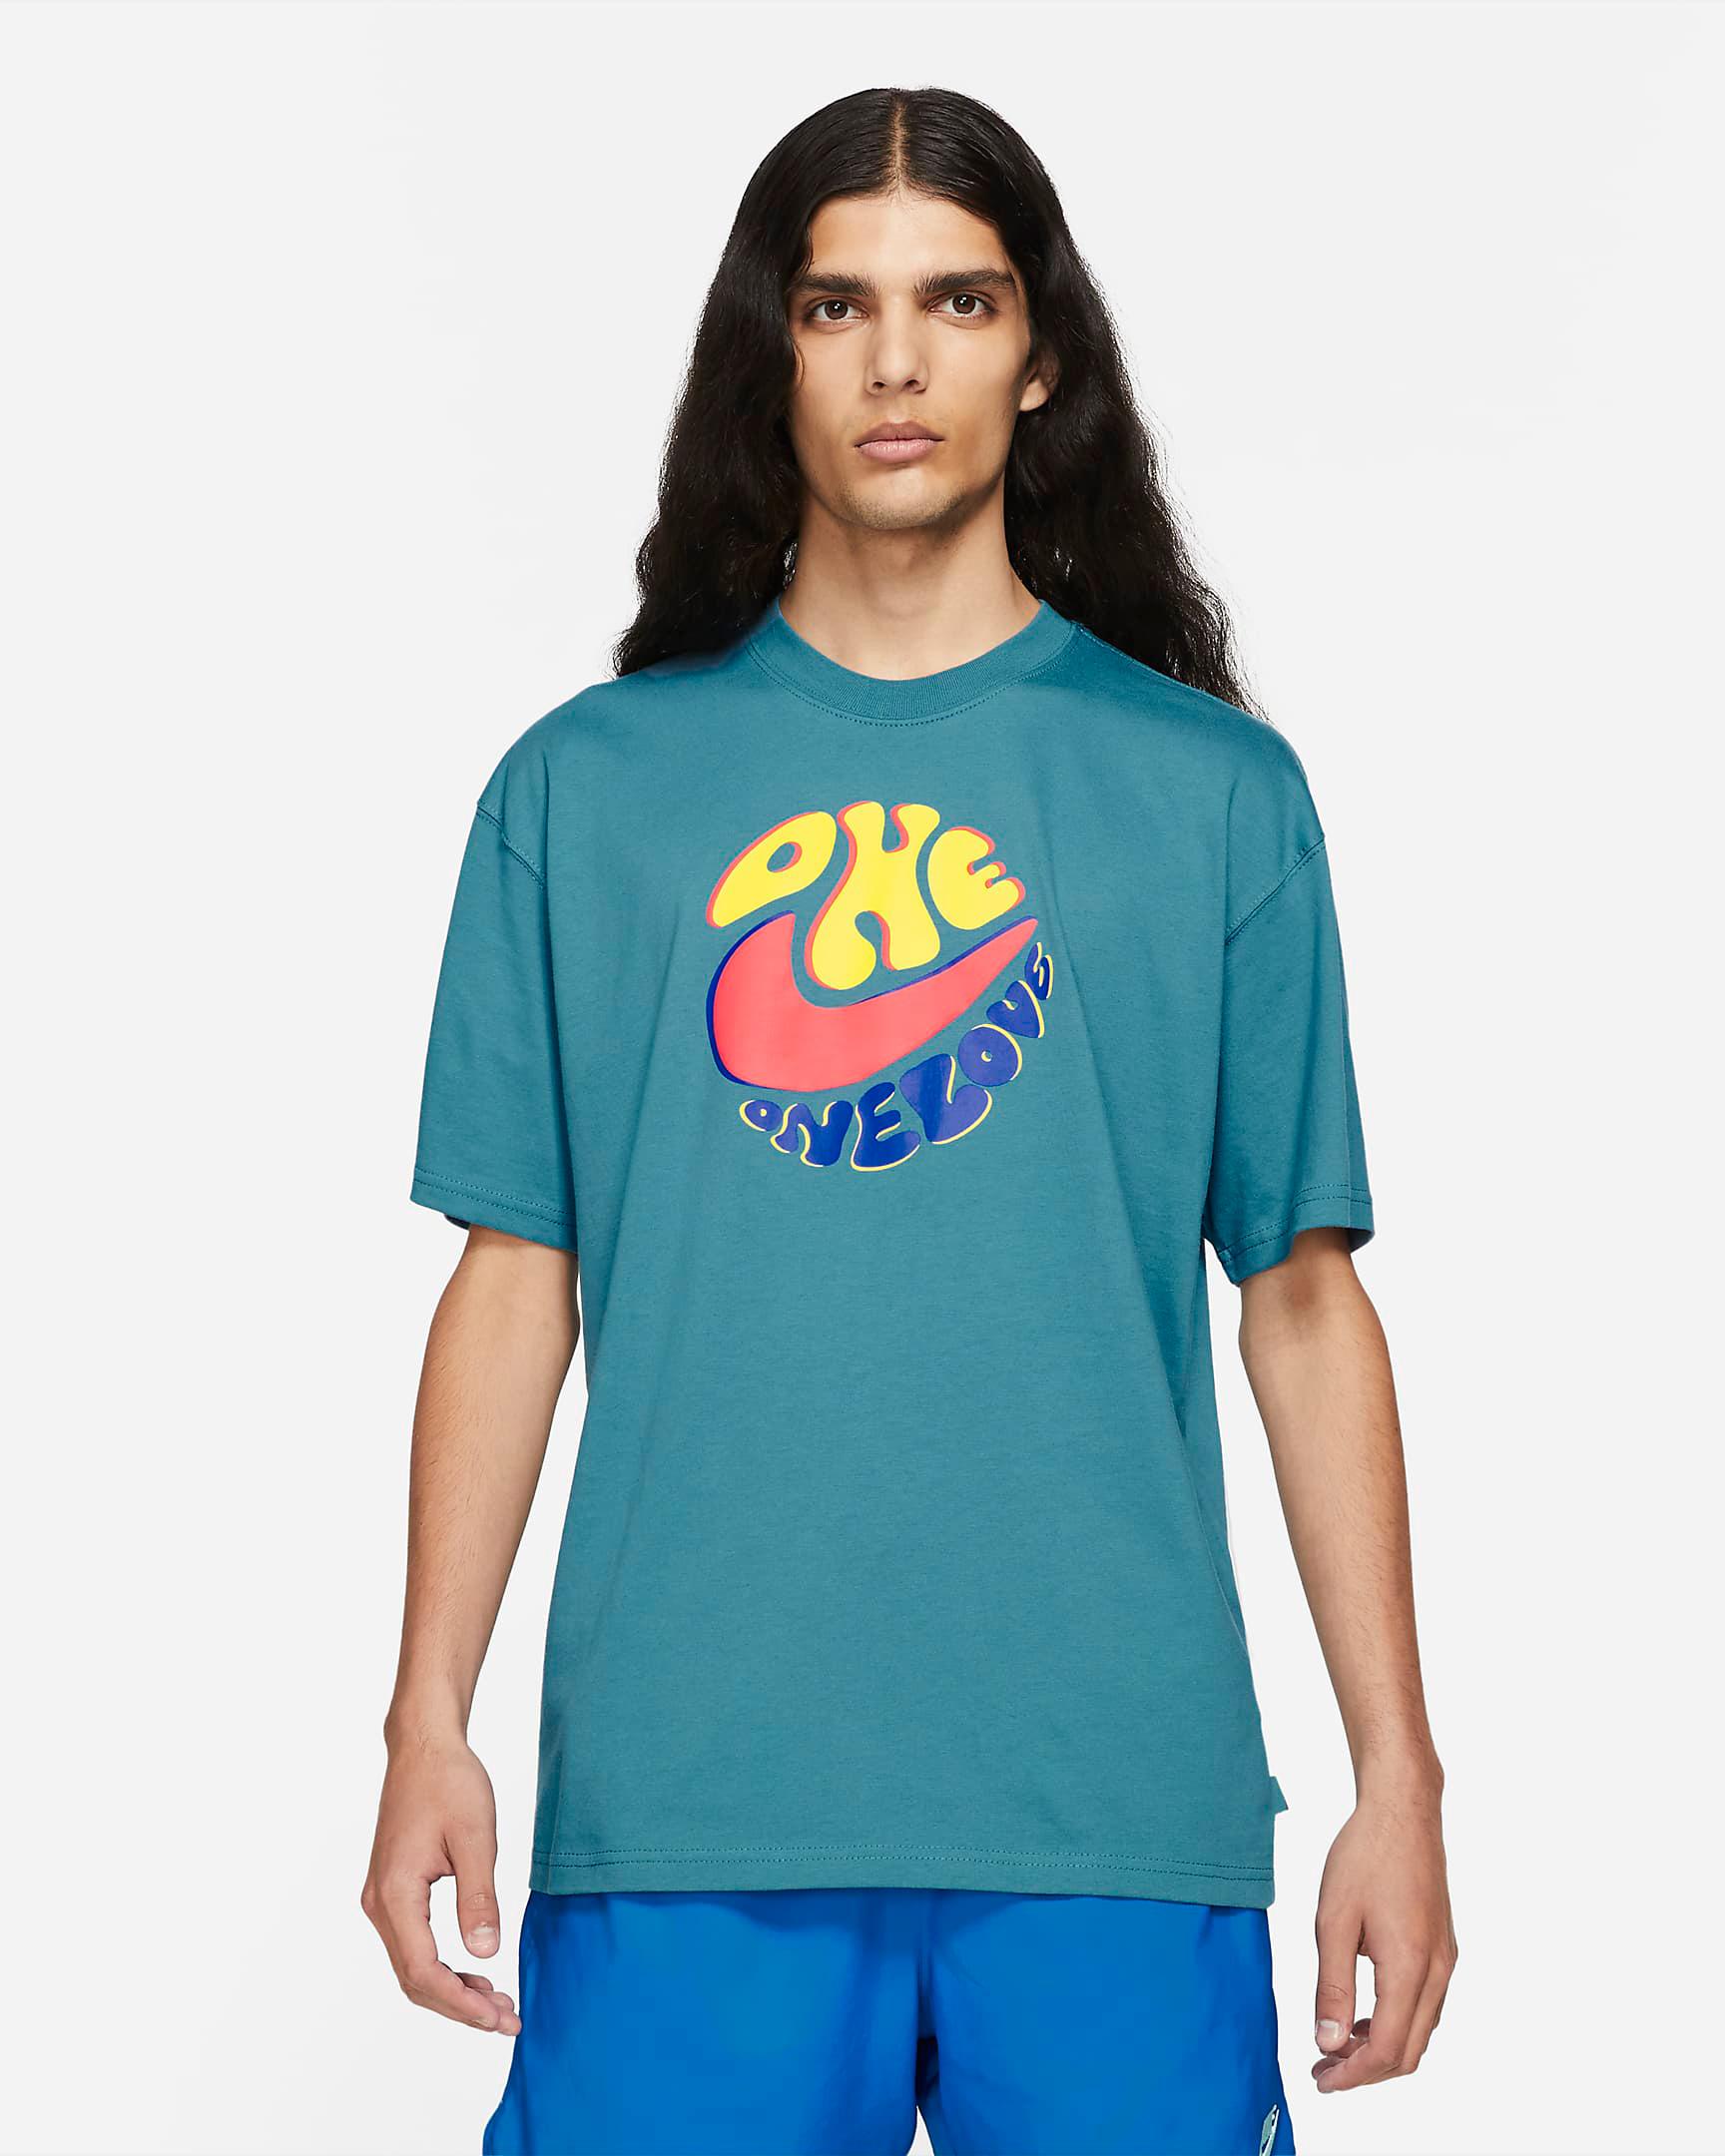 nike-peace-love-swoosh-shirt-green